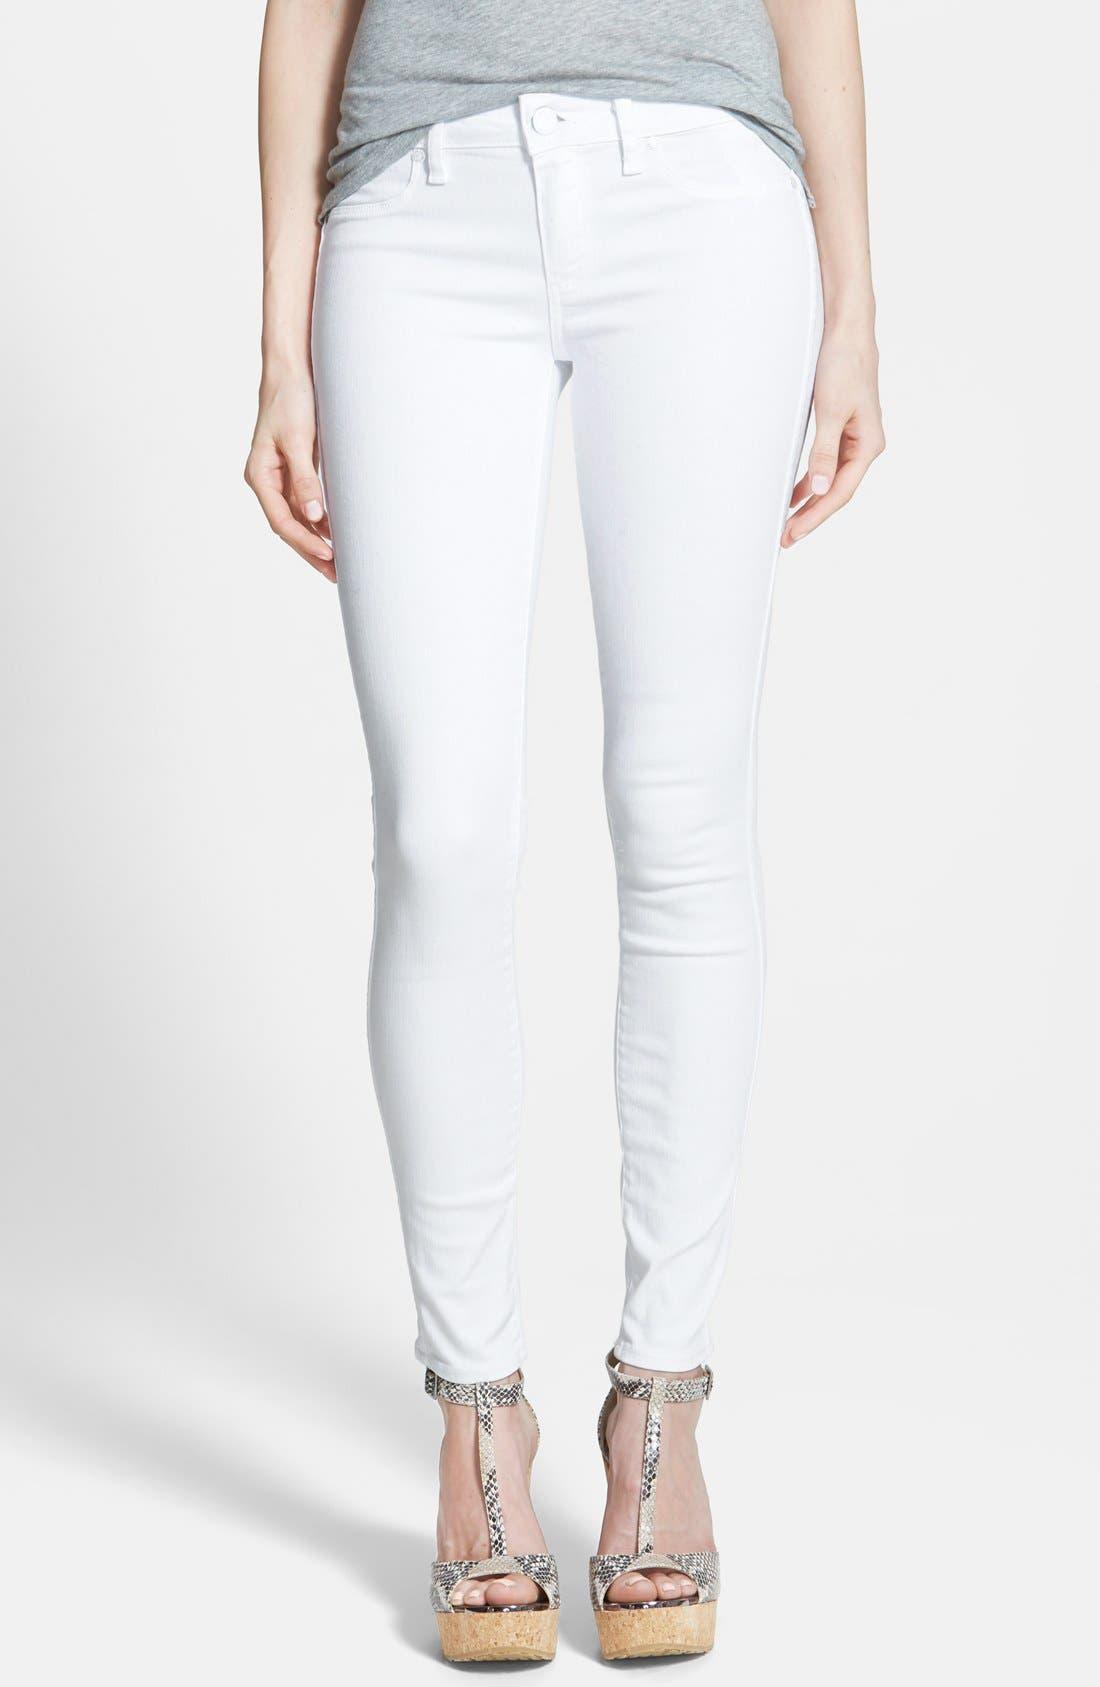 PAIGE, 'Verdugo' Ultra Skinny Jeans, Main thumbnail 1, color, 100